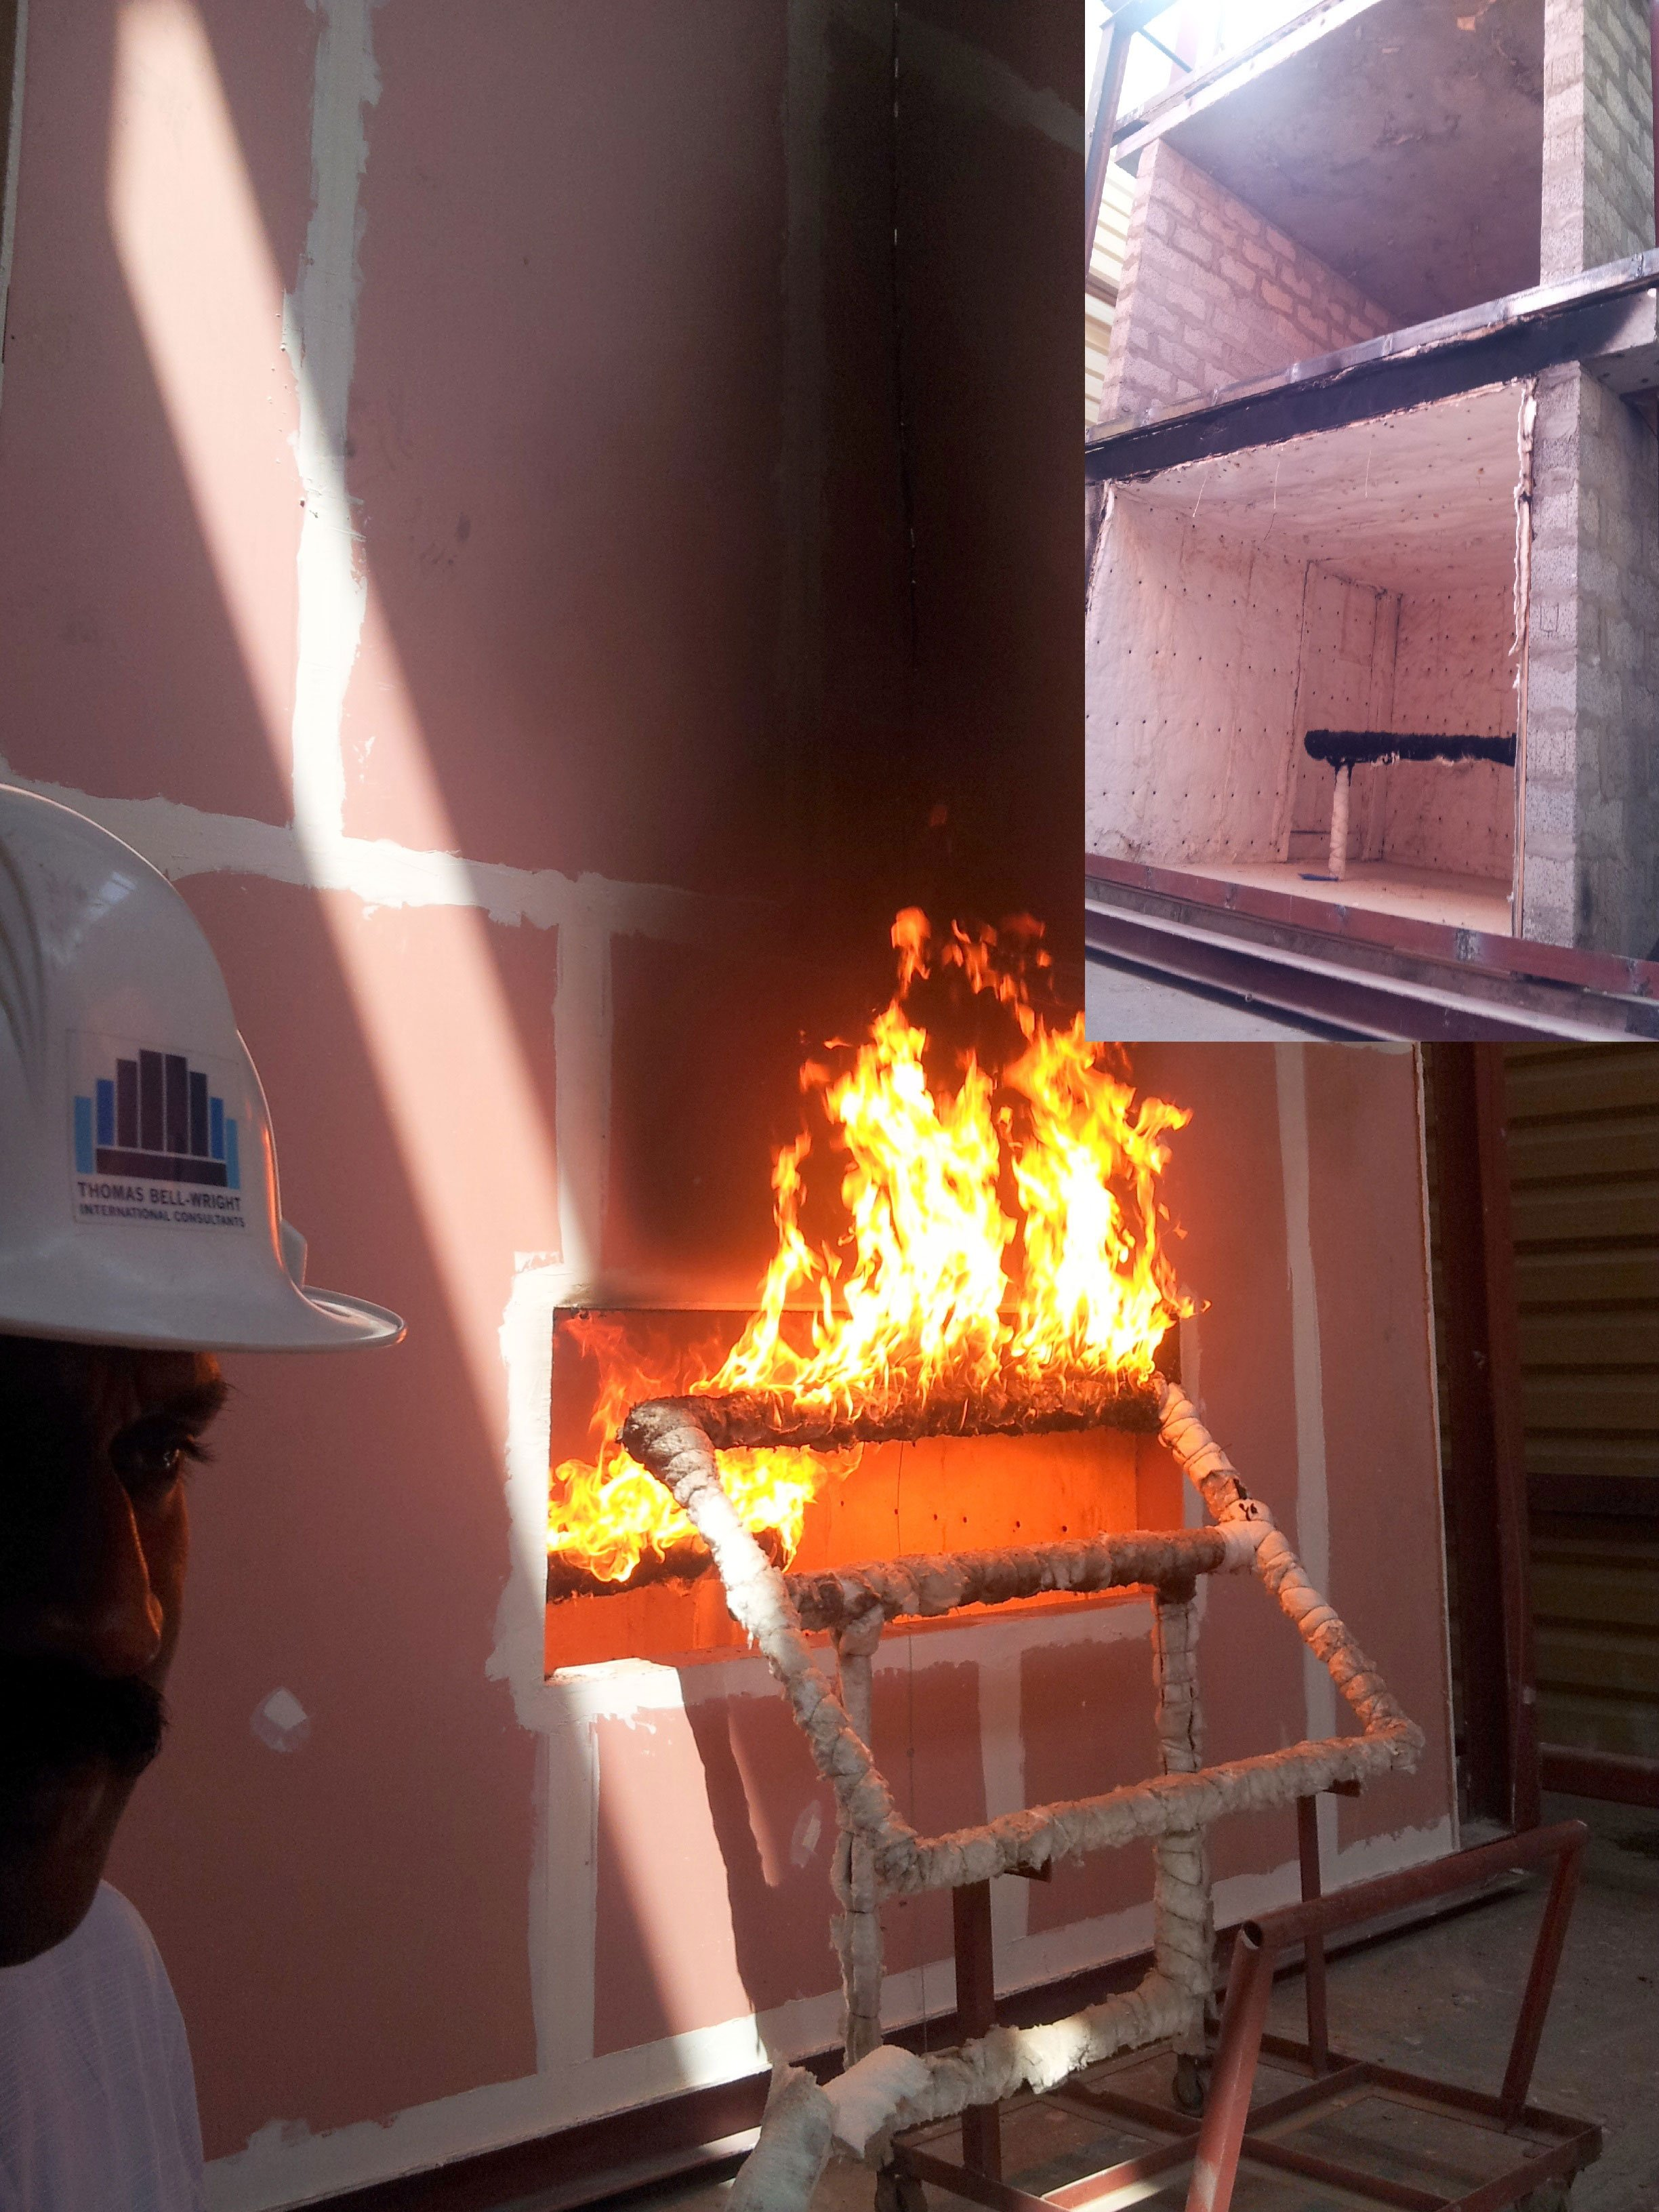 Dubai-fire-test-4-crop-c4d43e740d054a839da1b3d0c12c1201d58e8825